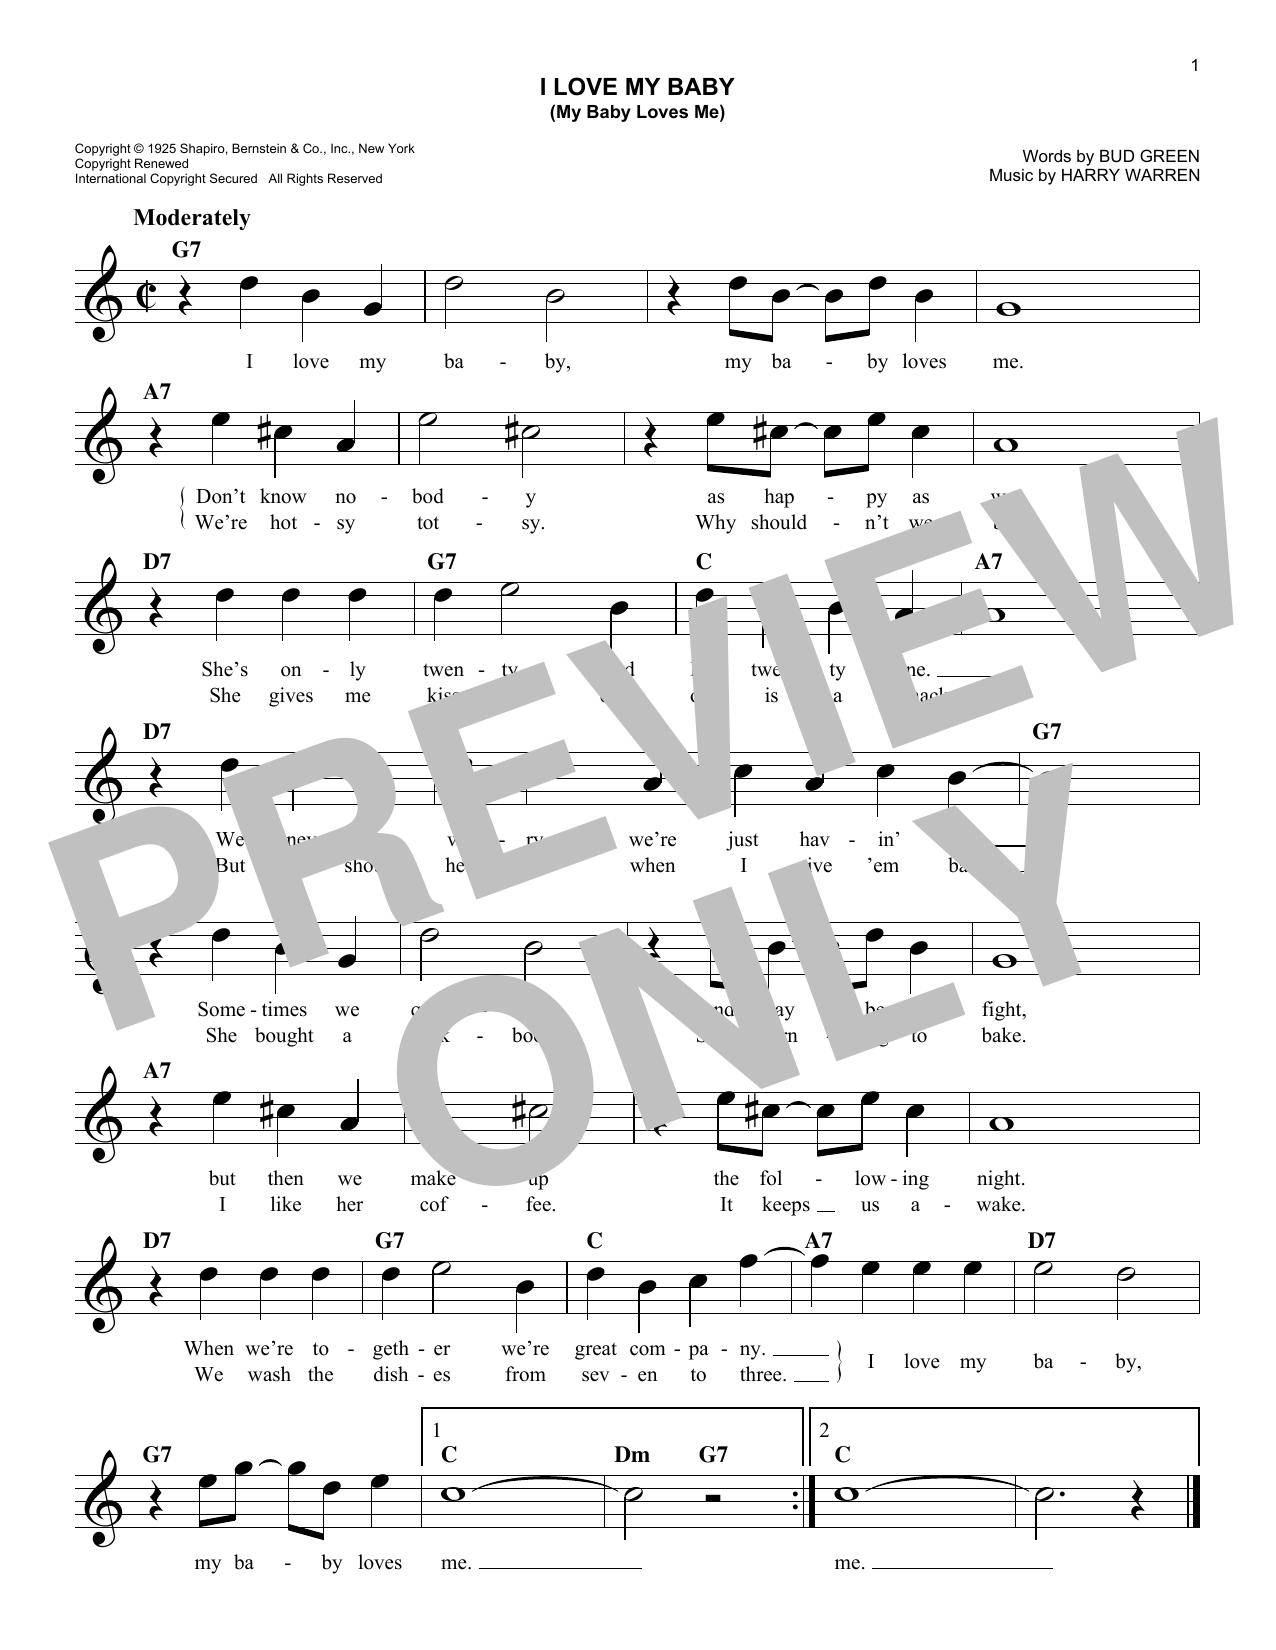 I Love My Baby (My Baby Loves Me) Sheet Music